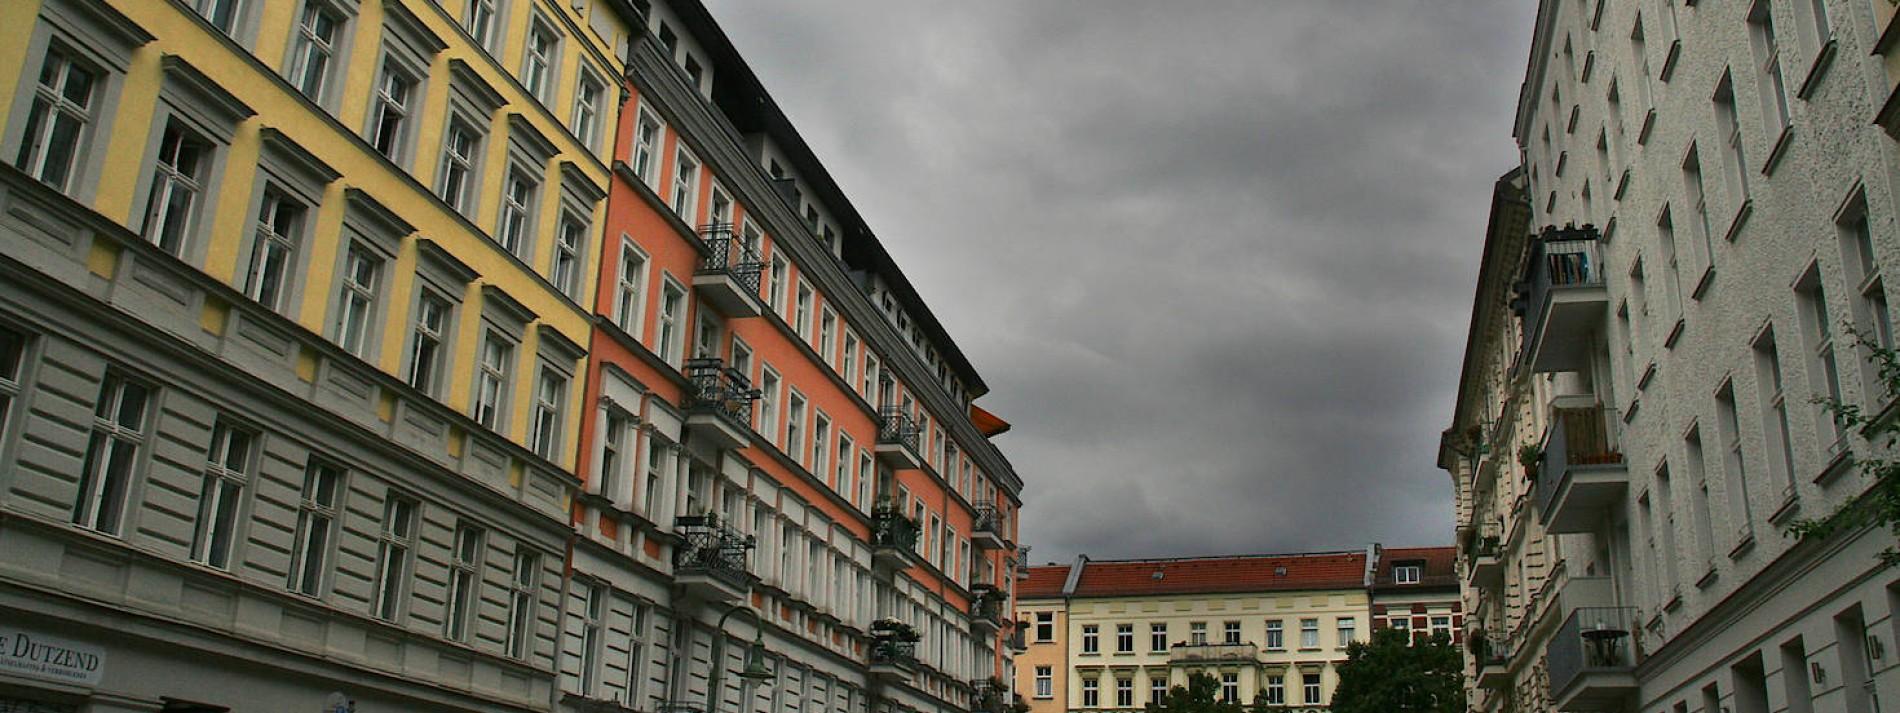 Der Mietendeckel verschärft Berlins Wohnungsnot